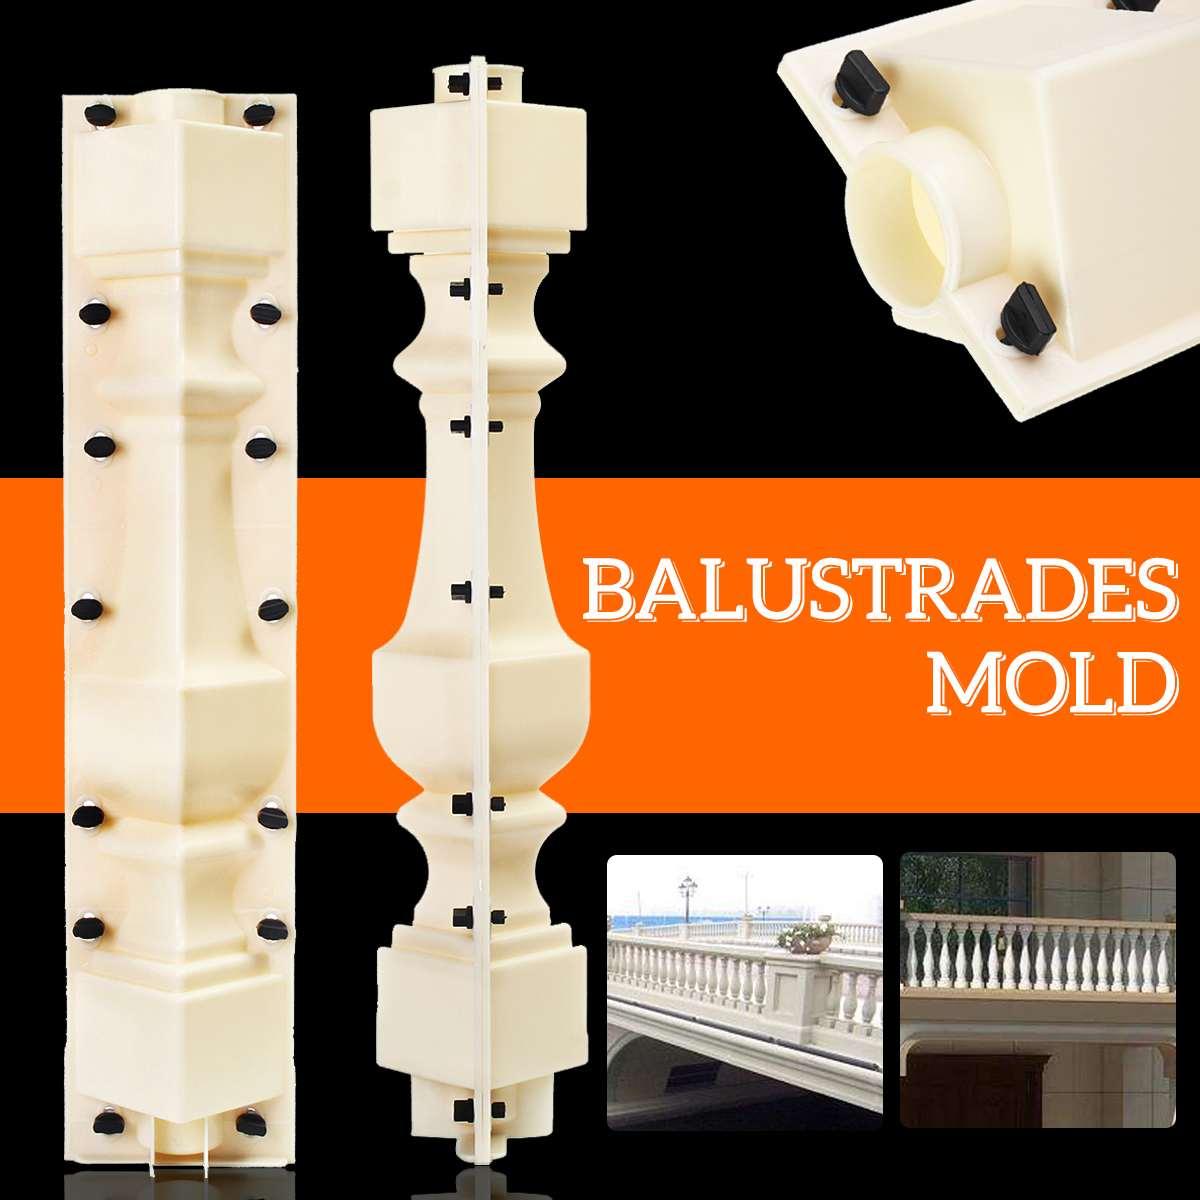 2pcs 70cm Concrete Cement Mold Garden Balustrades Balcony Fence Roman Column Mold Railing Plaster Mould Paving Molds Pool DIY